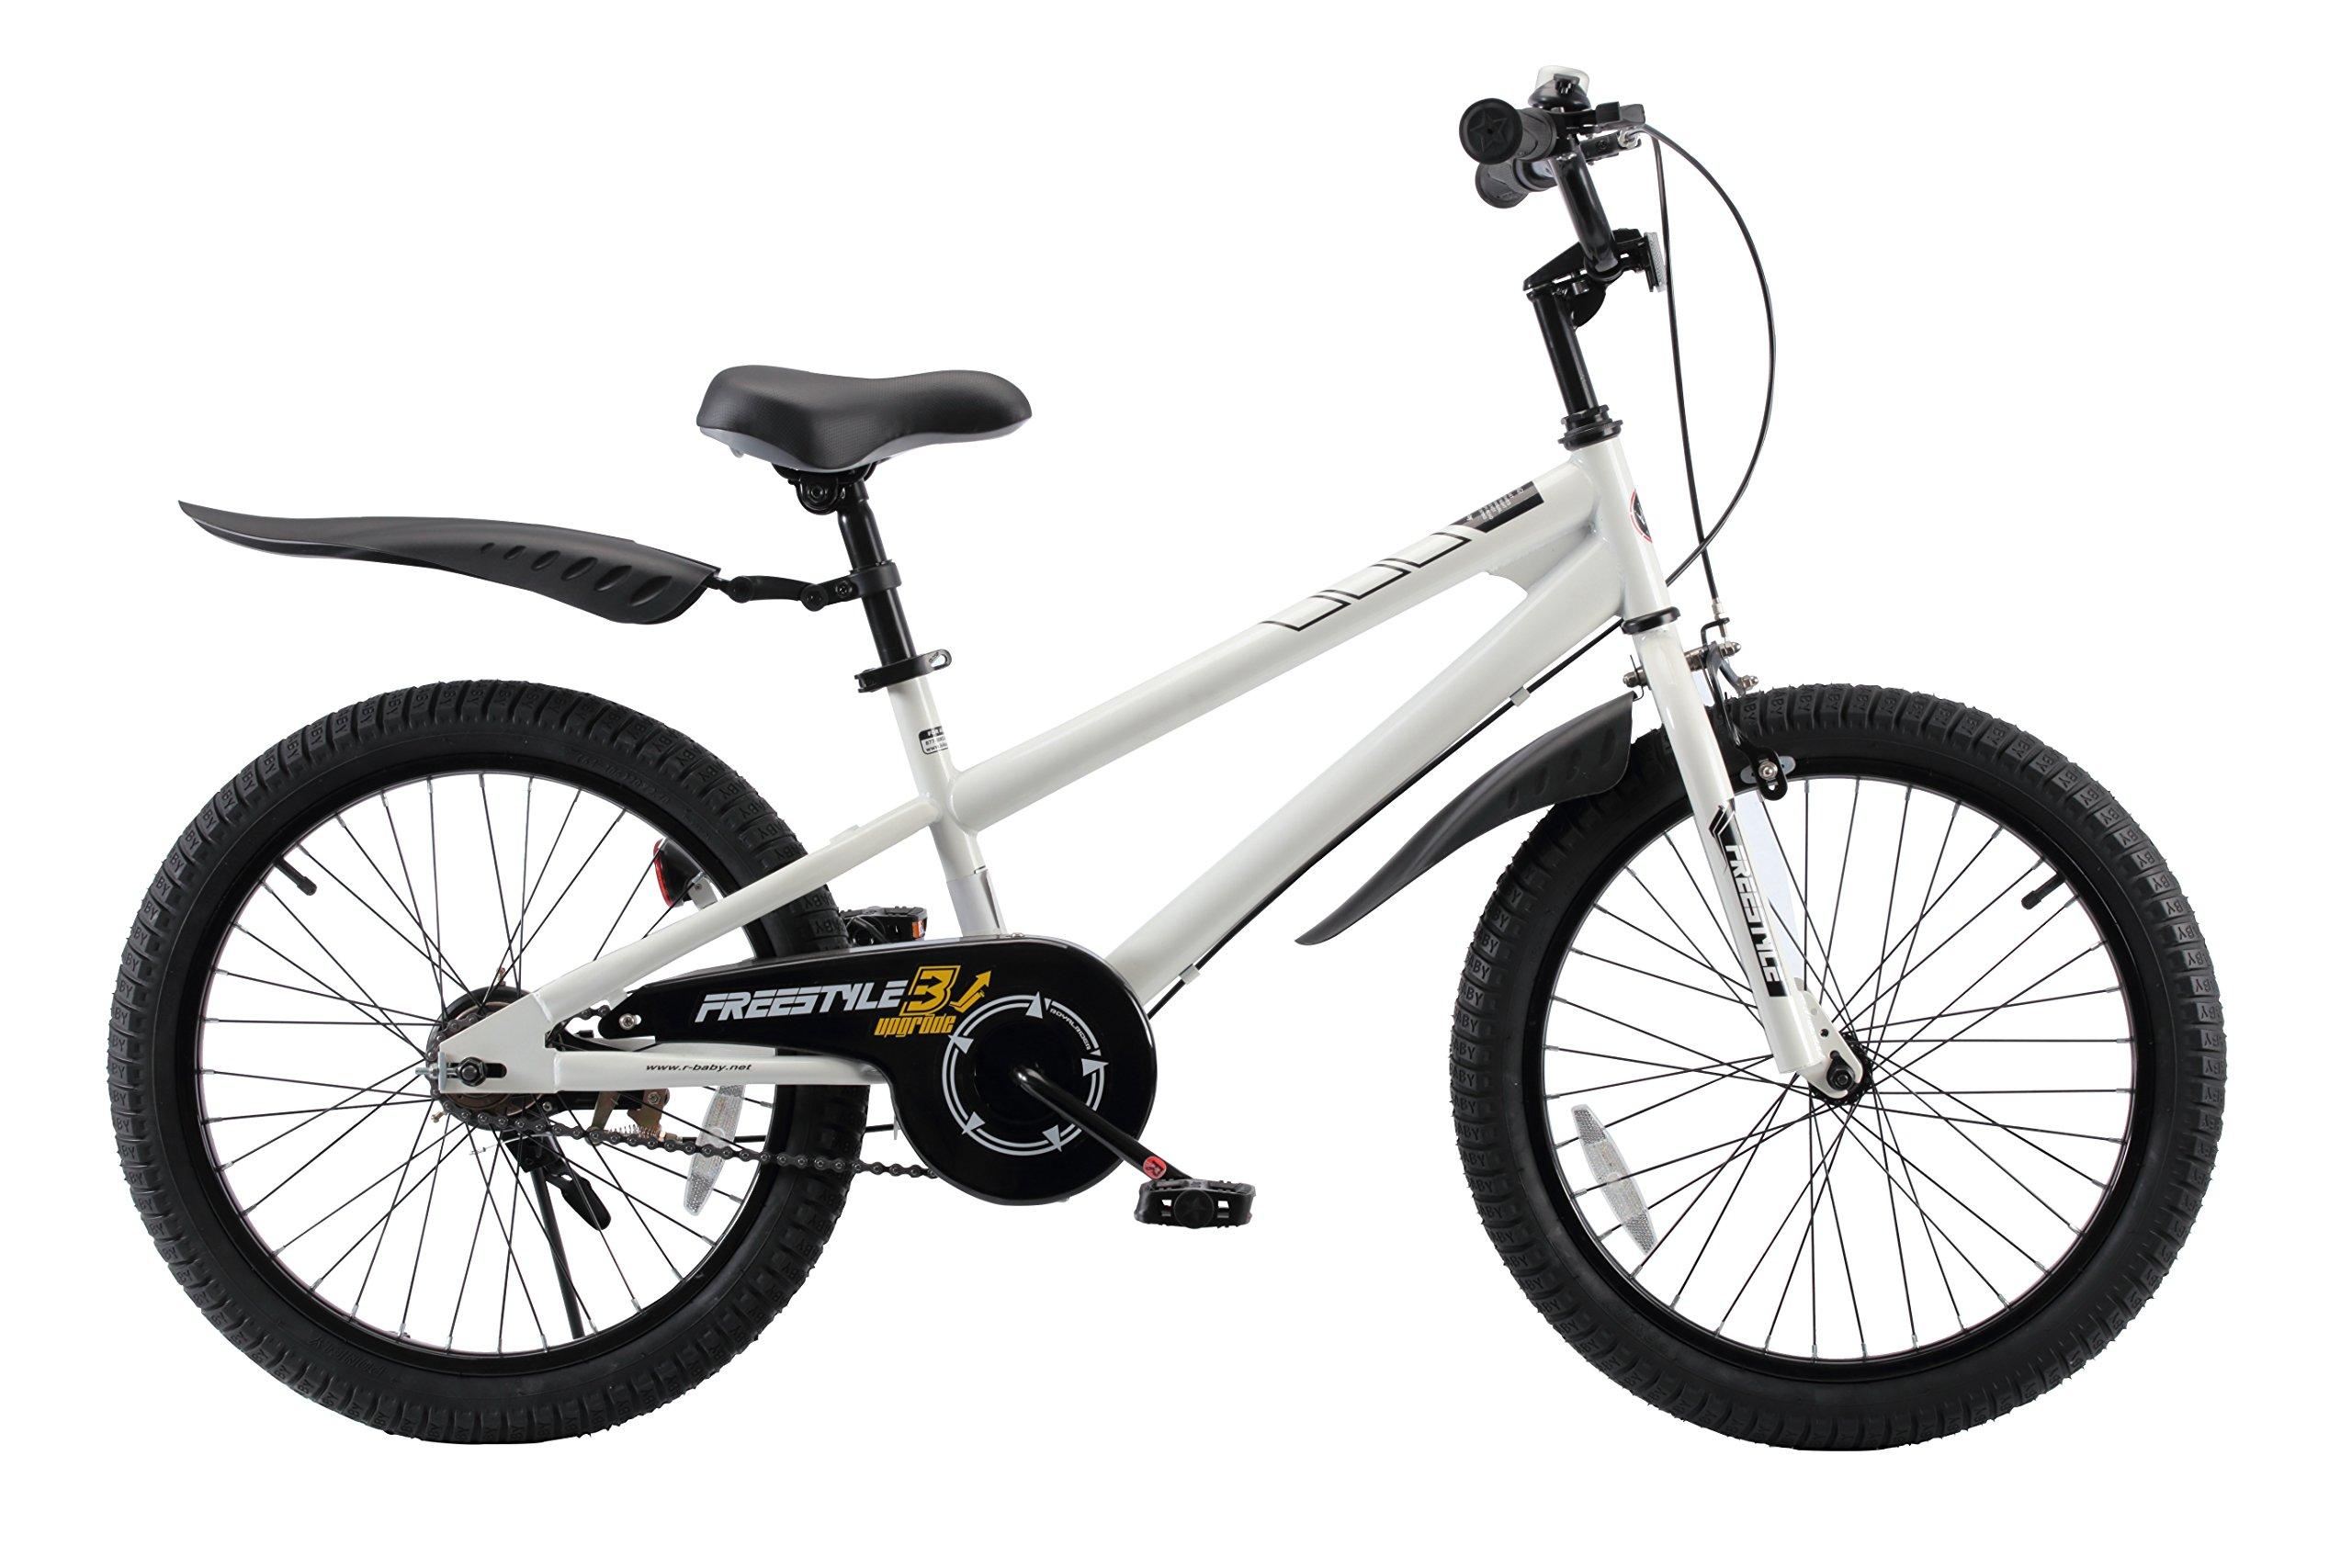 RoyalBaby BMX Freestyle Kids Bike, Boy's Bikes and Girl's Bikes, Gifts for children, 20 inch wheels, White by Royalbaby